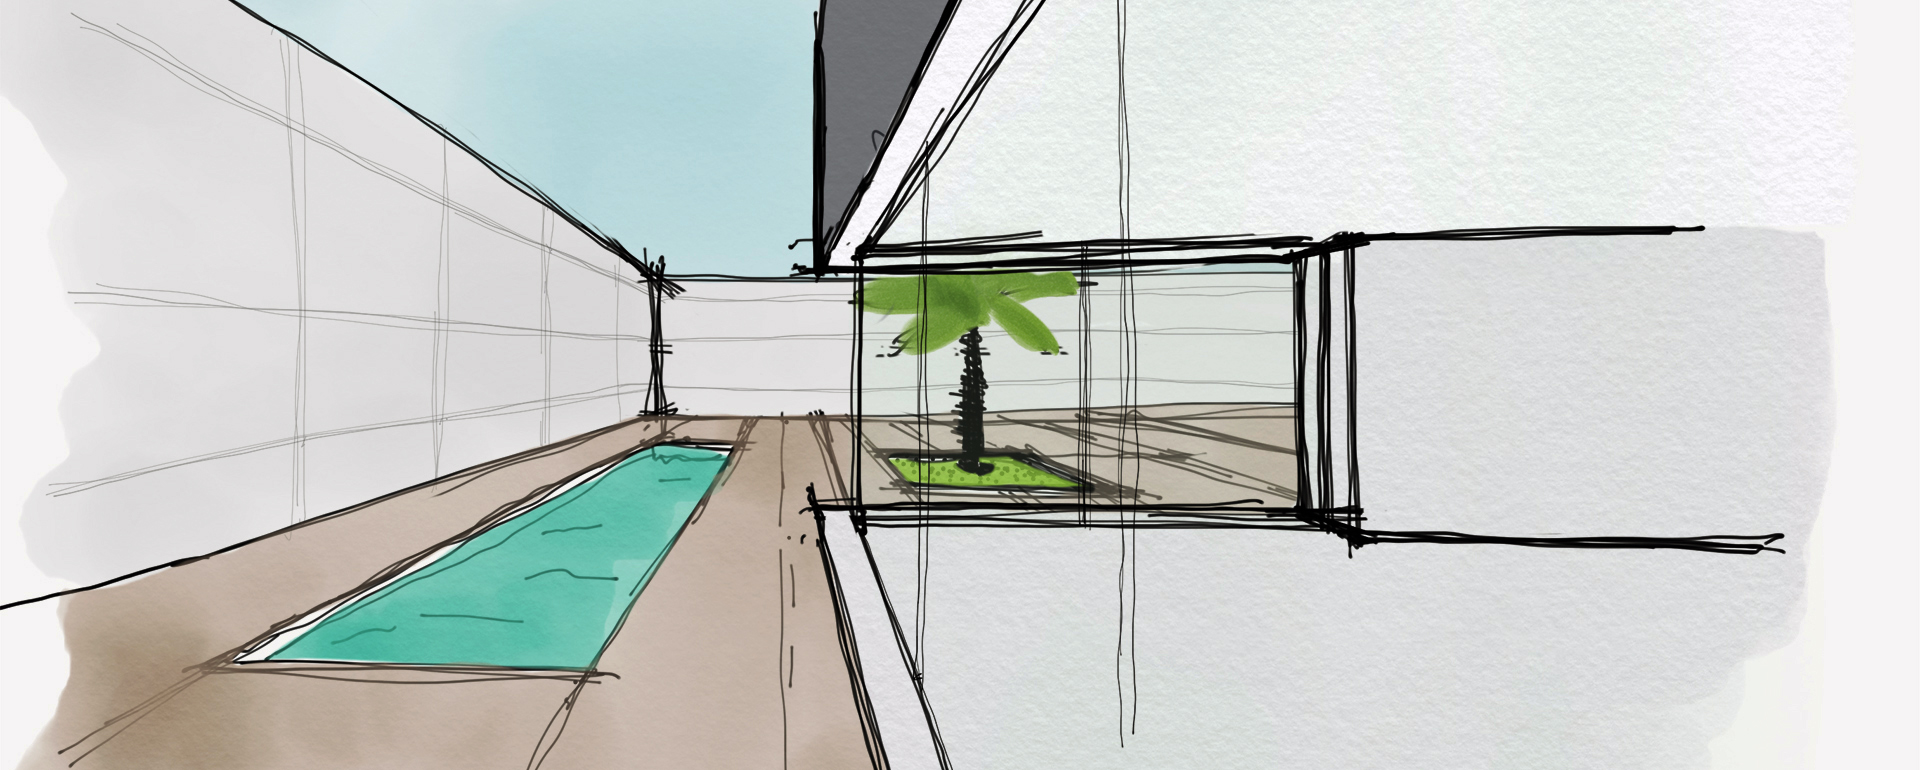 Family - Sketch 1